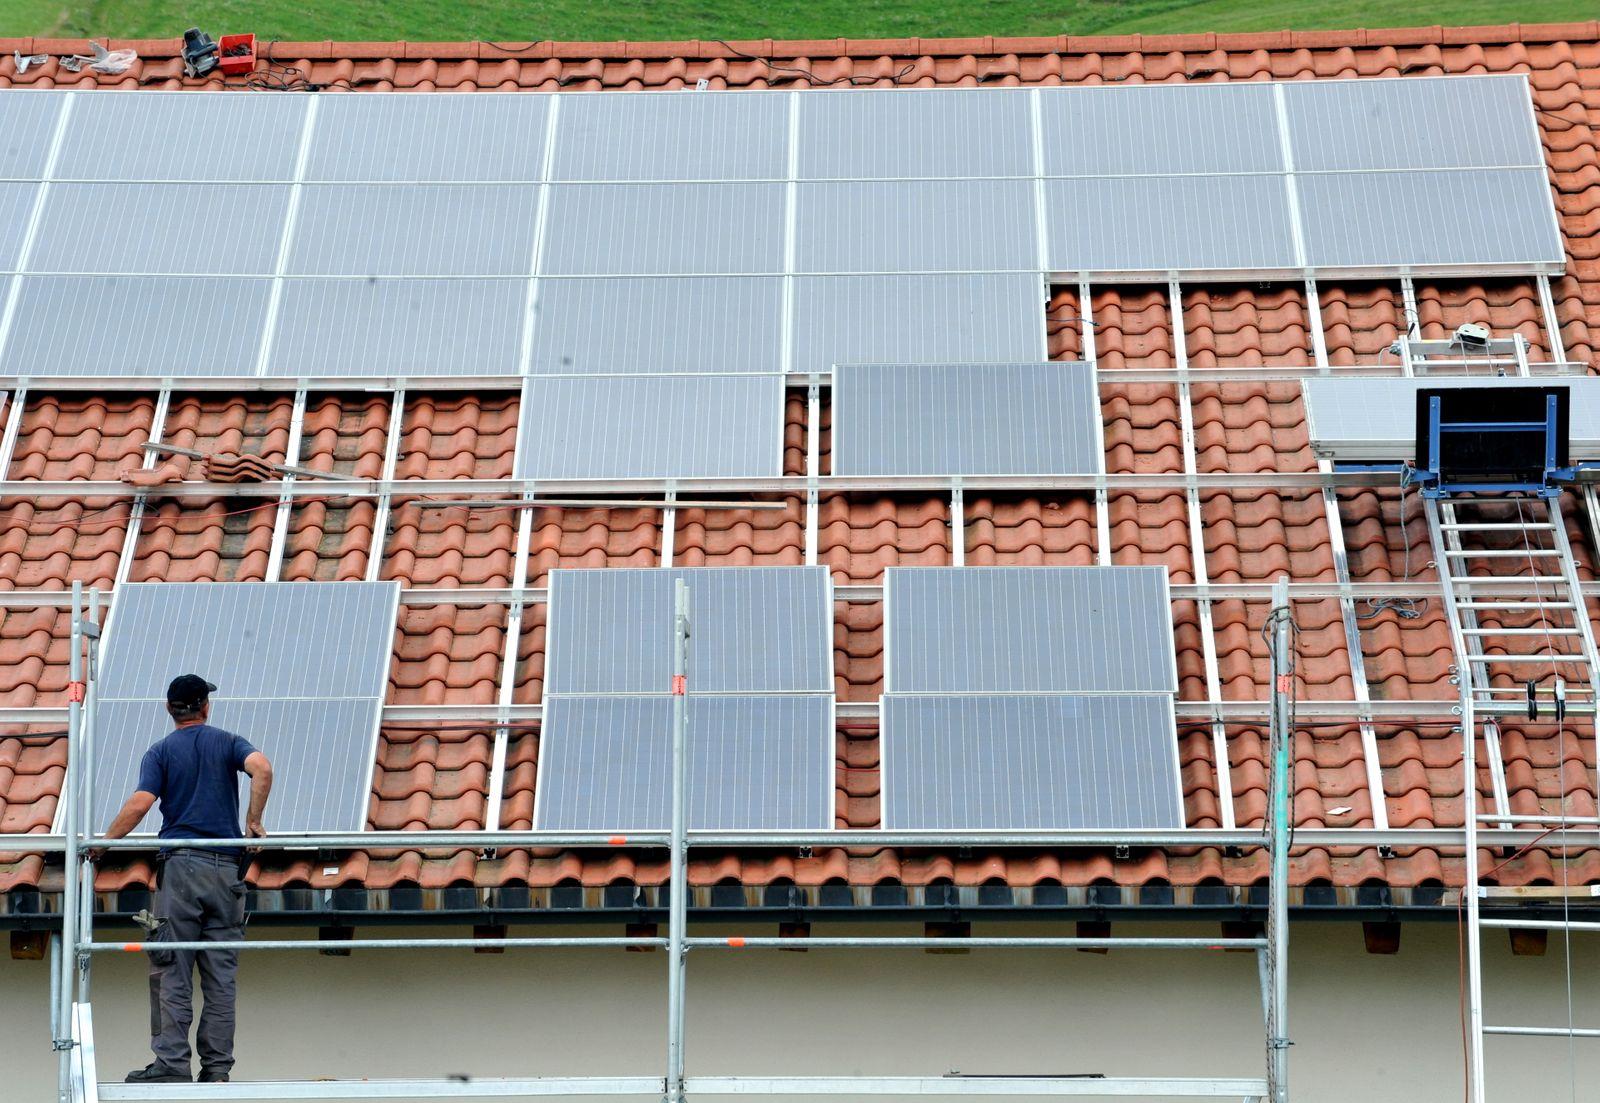 Soloarenergie / Photovoltaik